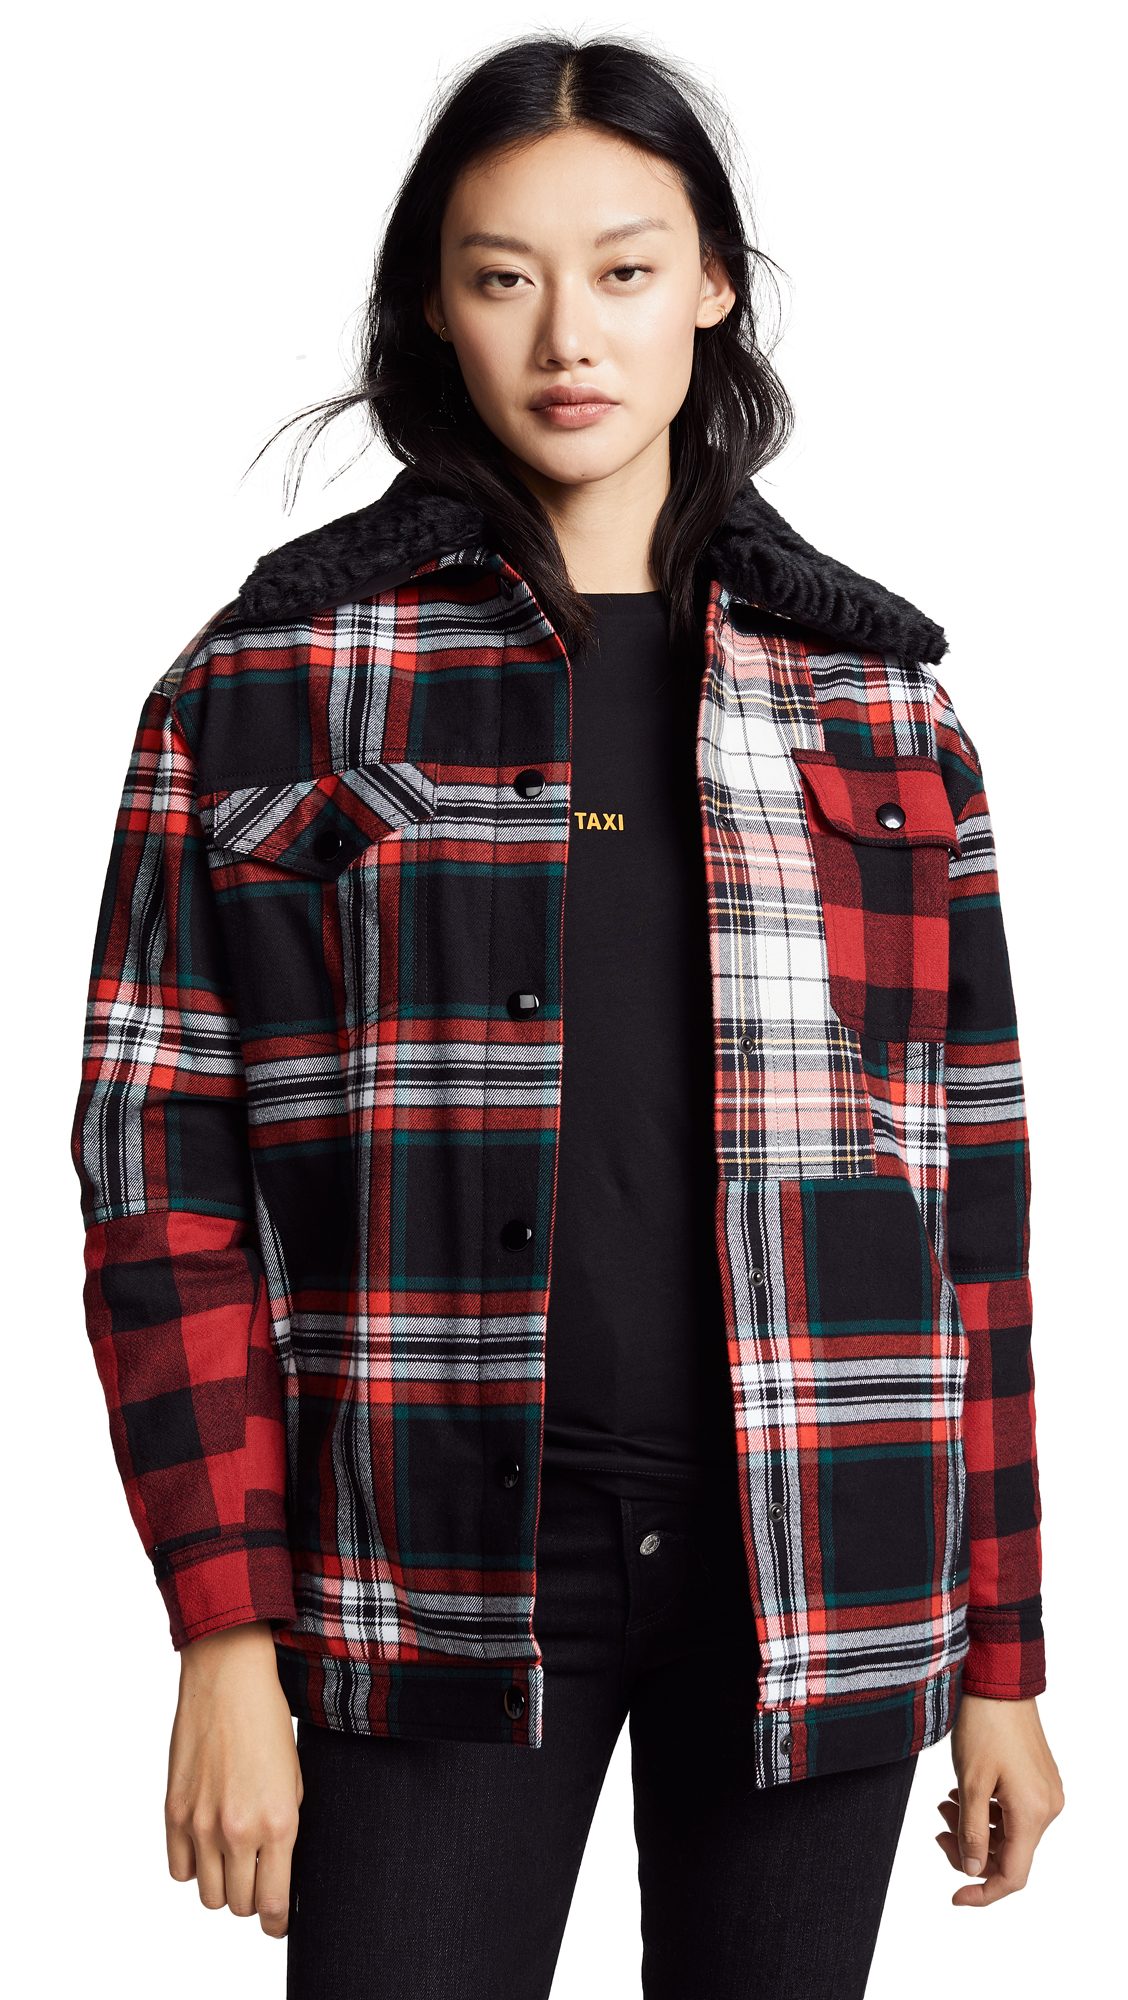 Photo of McQ - Alexander McQueen Tartan Boxy Jacket online jackets sales